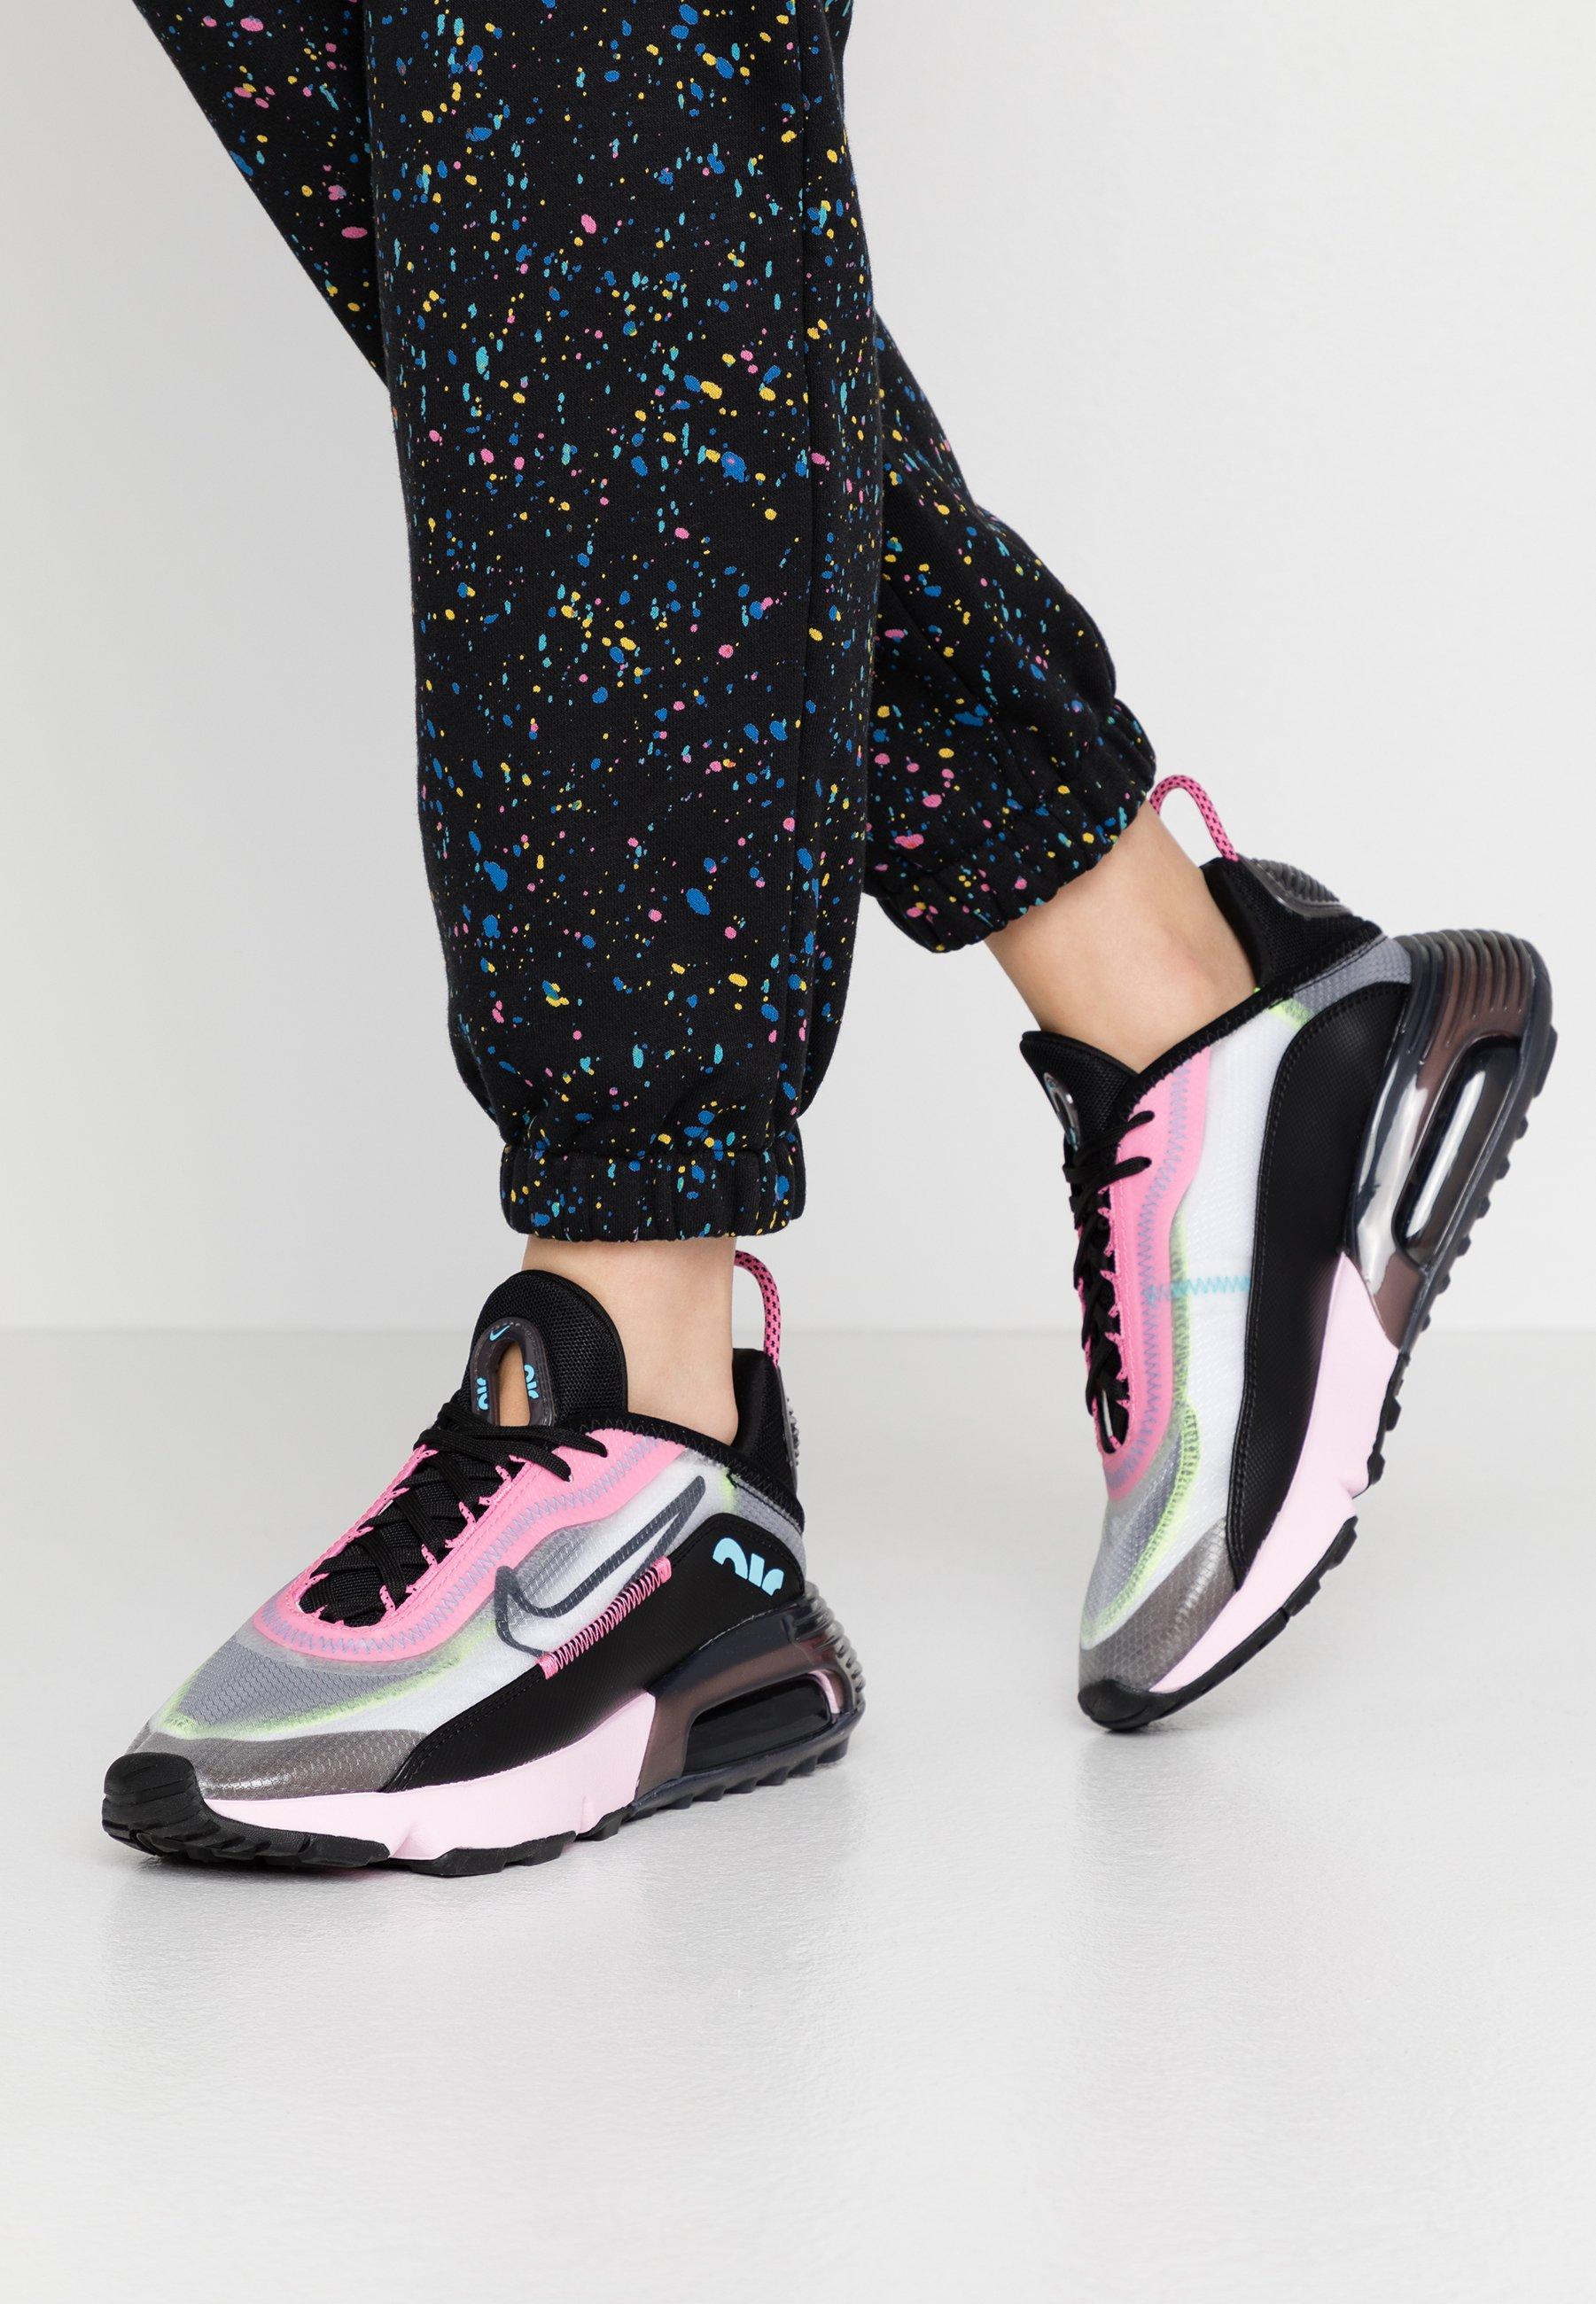 AIR MAX 2090 Sneaker low whiteblackpink foamlotus pinkvoltblue gaze